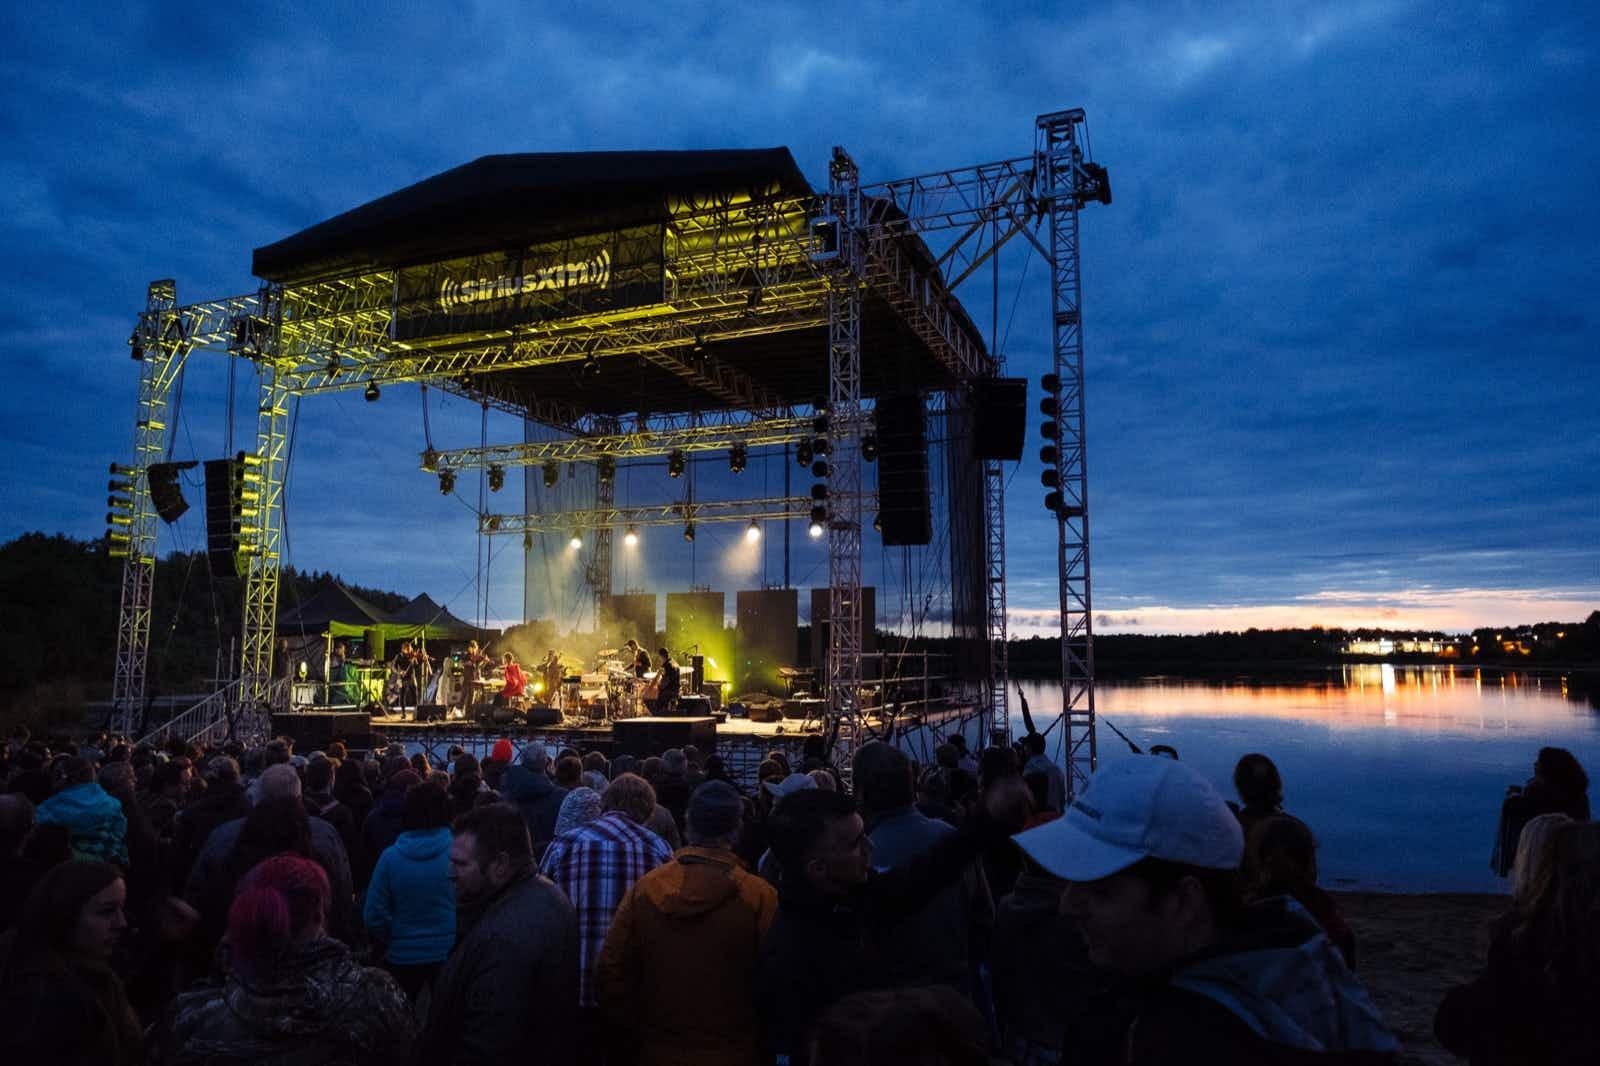 A large outdoor, open-air stage is lit at twilight as it sits beside a lake, while music fans listen © Festival de musique émergente